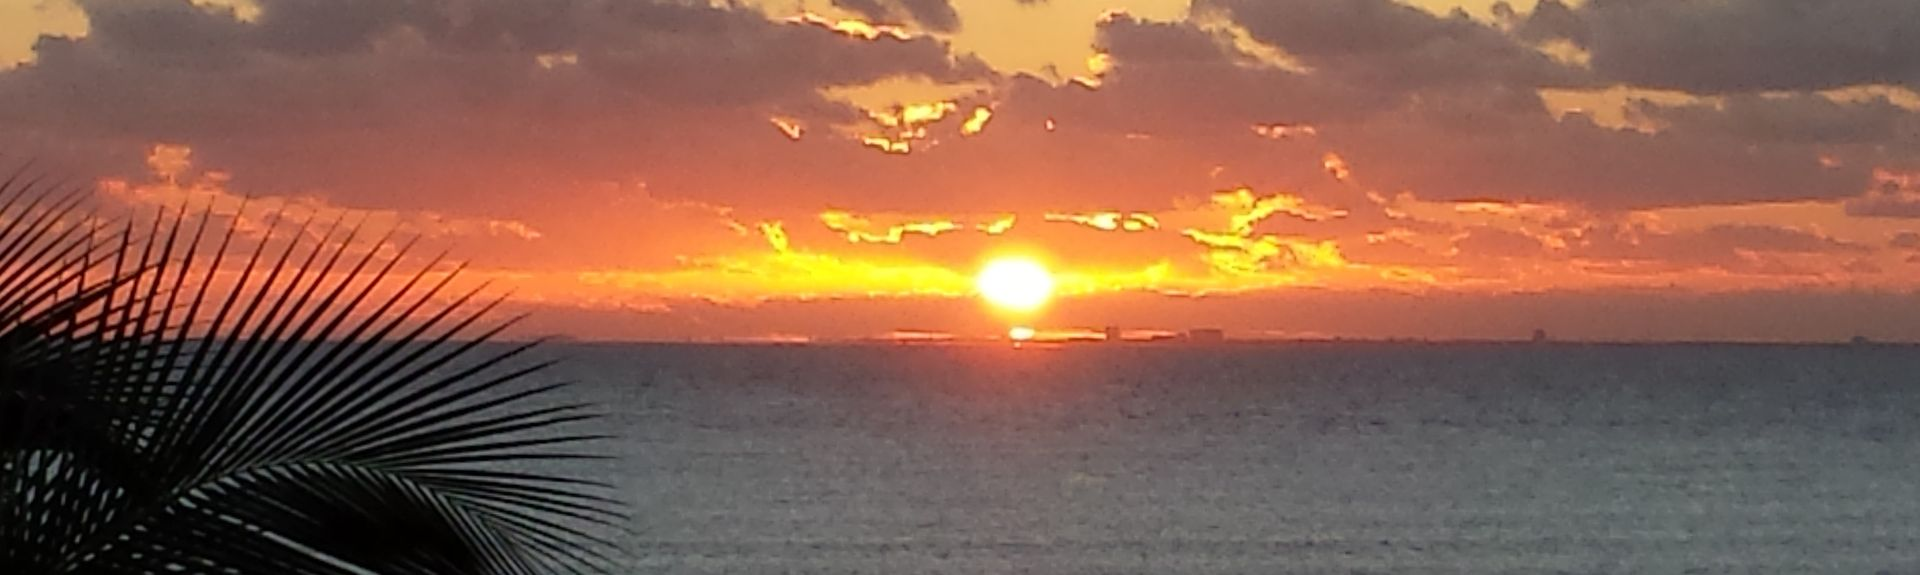 Royal Sunset Fishermen's Resort, Playacar, Playa del Carmen, Q.R., Mexico